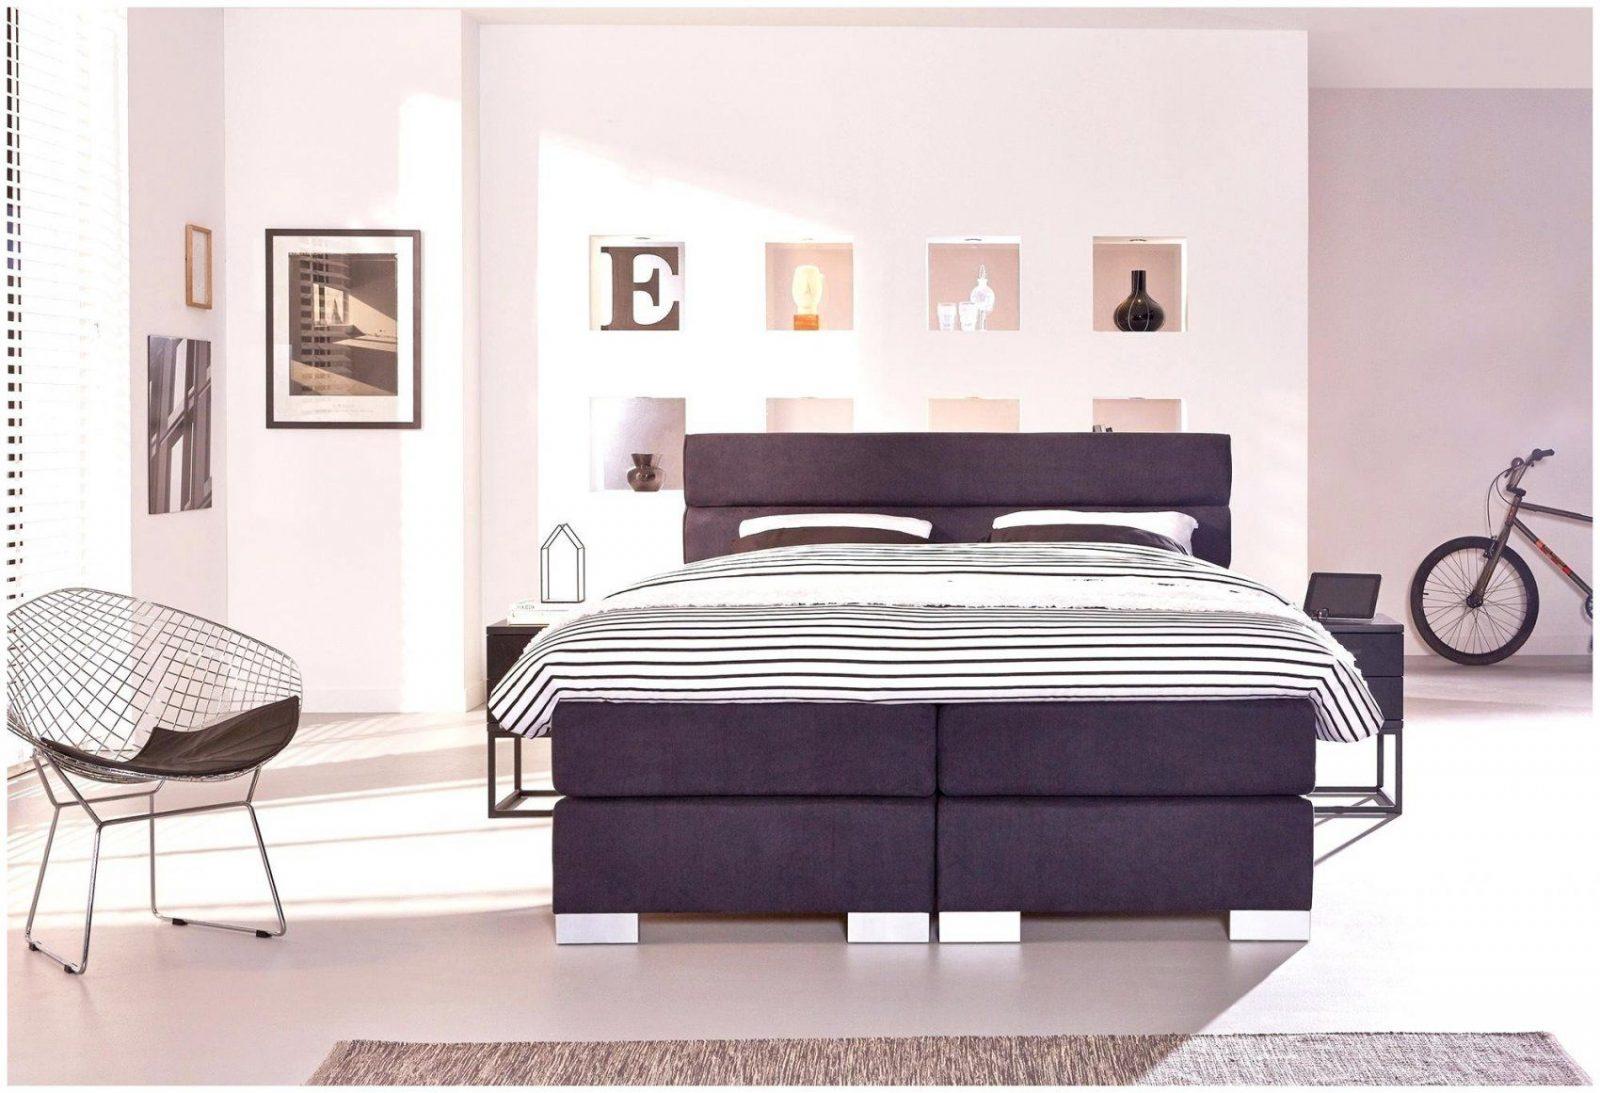 33 sch n ruf boxspringbett test bild dekor f r bed garten und von ruf boxspringbetten test photo. Black Bedroom Furniture Sets. Home Design Ideas